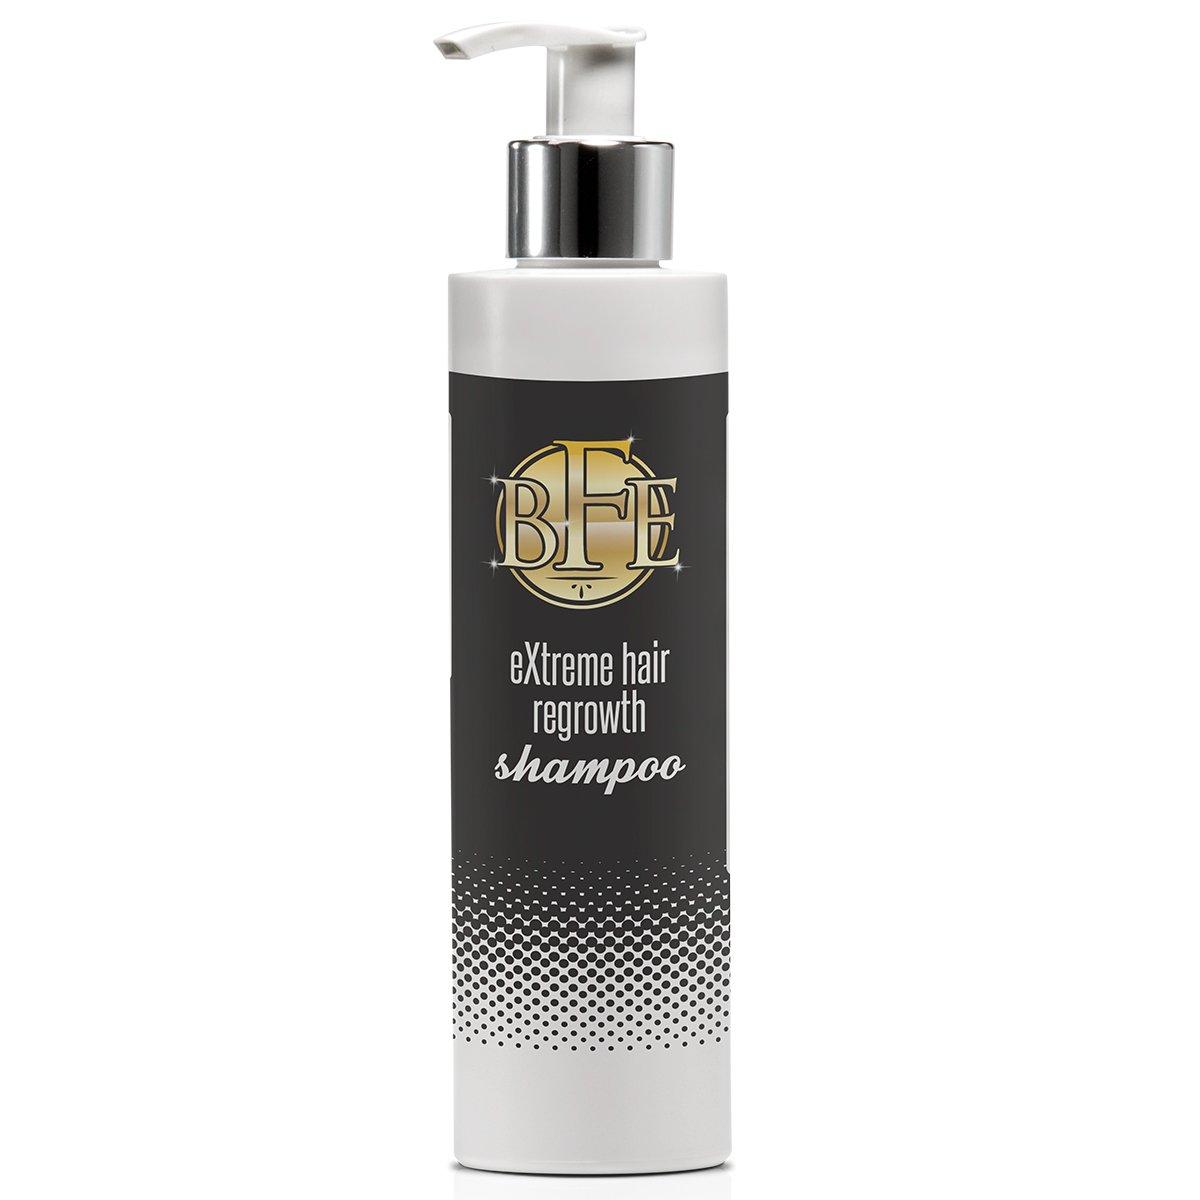 Hair Regrowth Limited time cheap sale Charlotte Mall Shampoo-Maximum Strength DHT St Repairs Blocker.